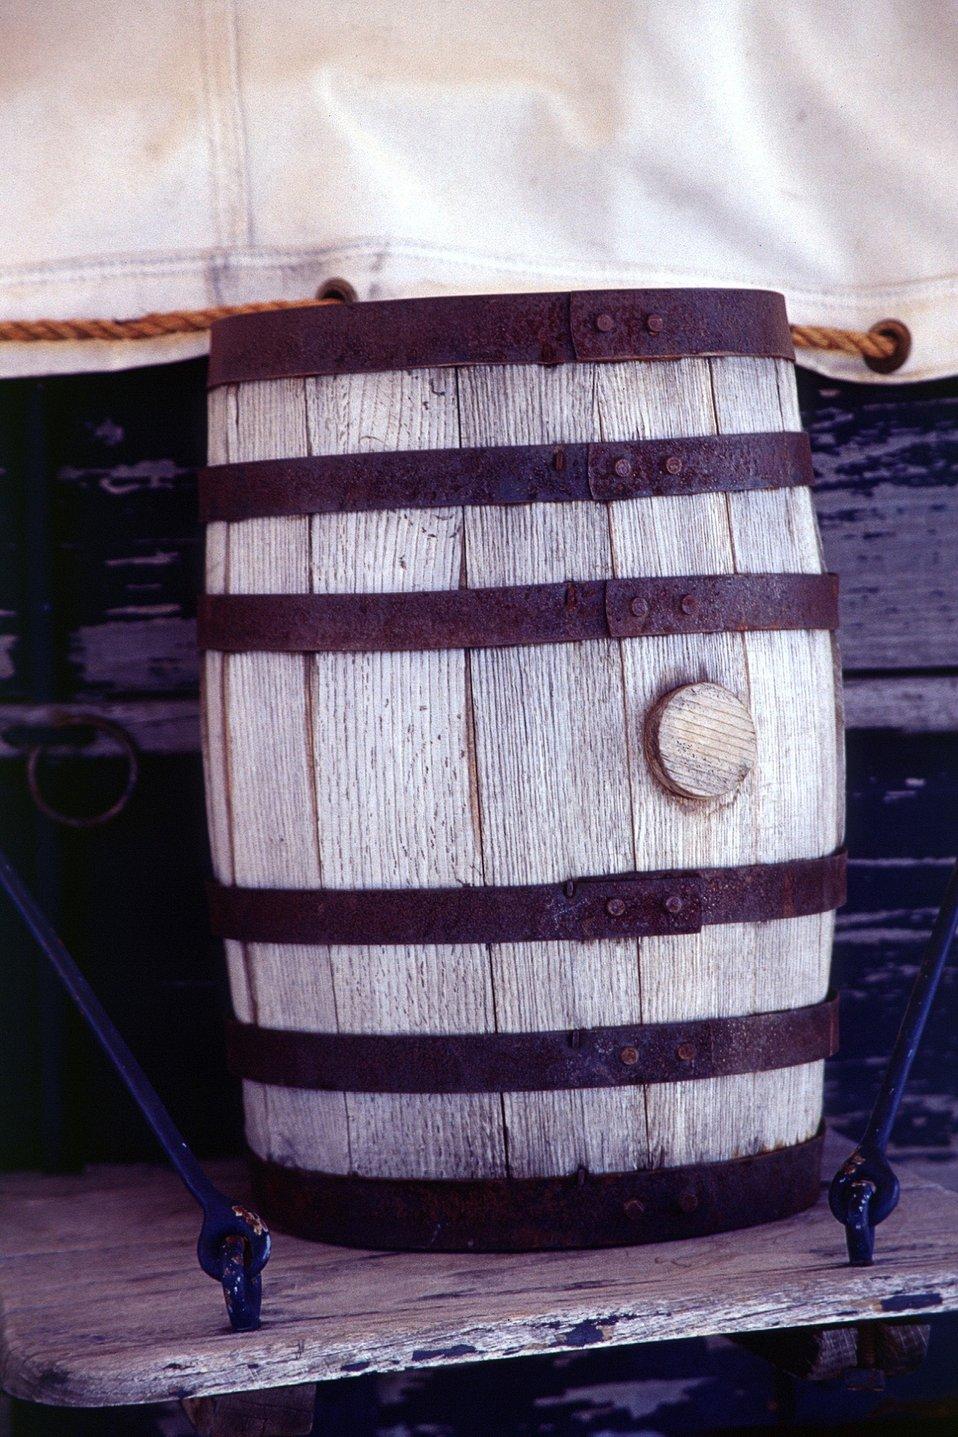 Medium shot of water barrel on covered wagon. NHOTIC 10th Anniversary.